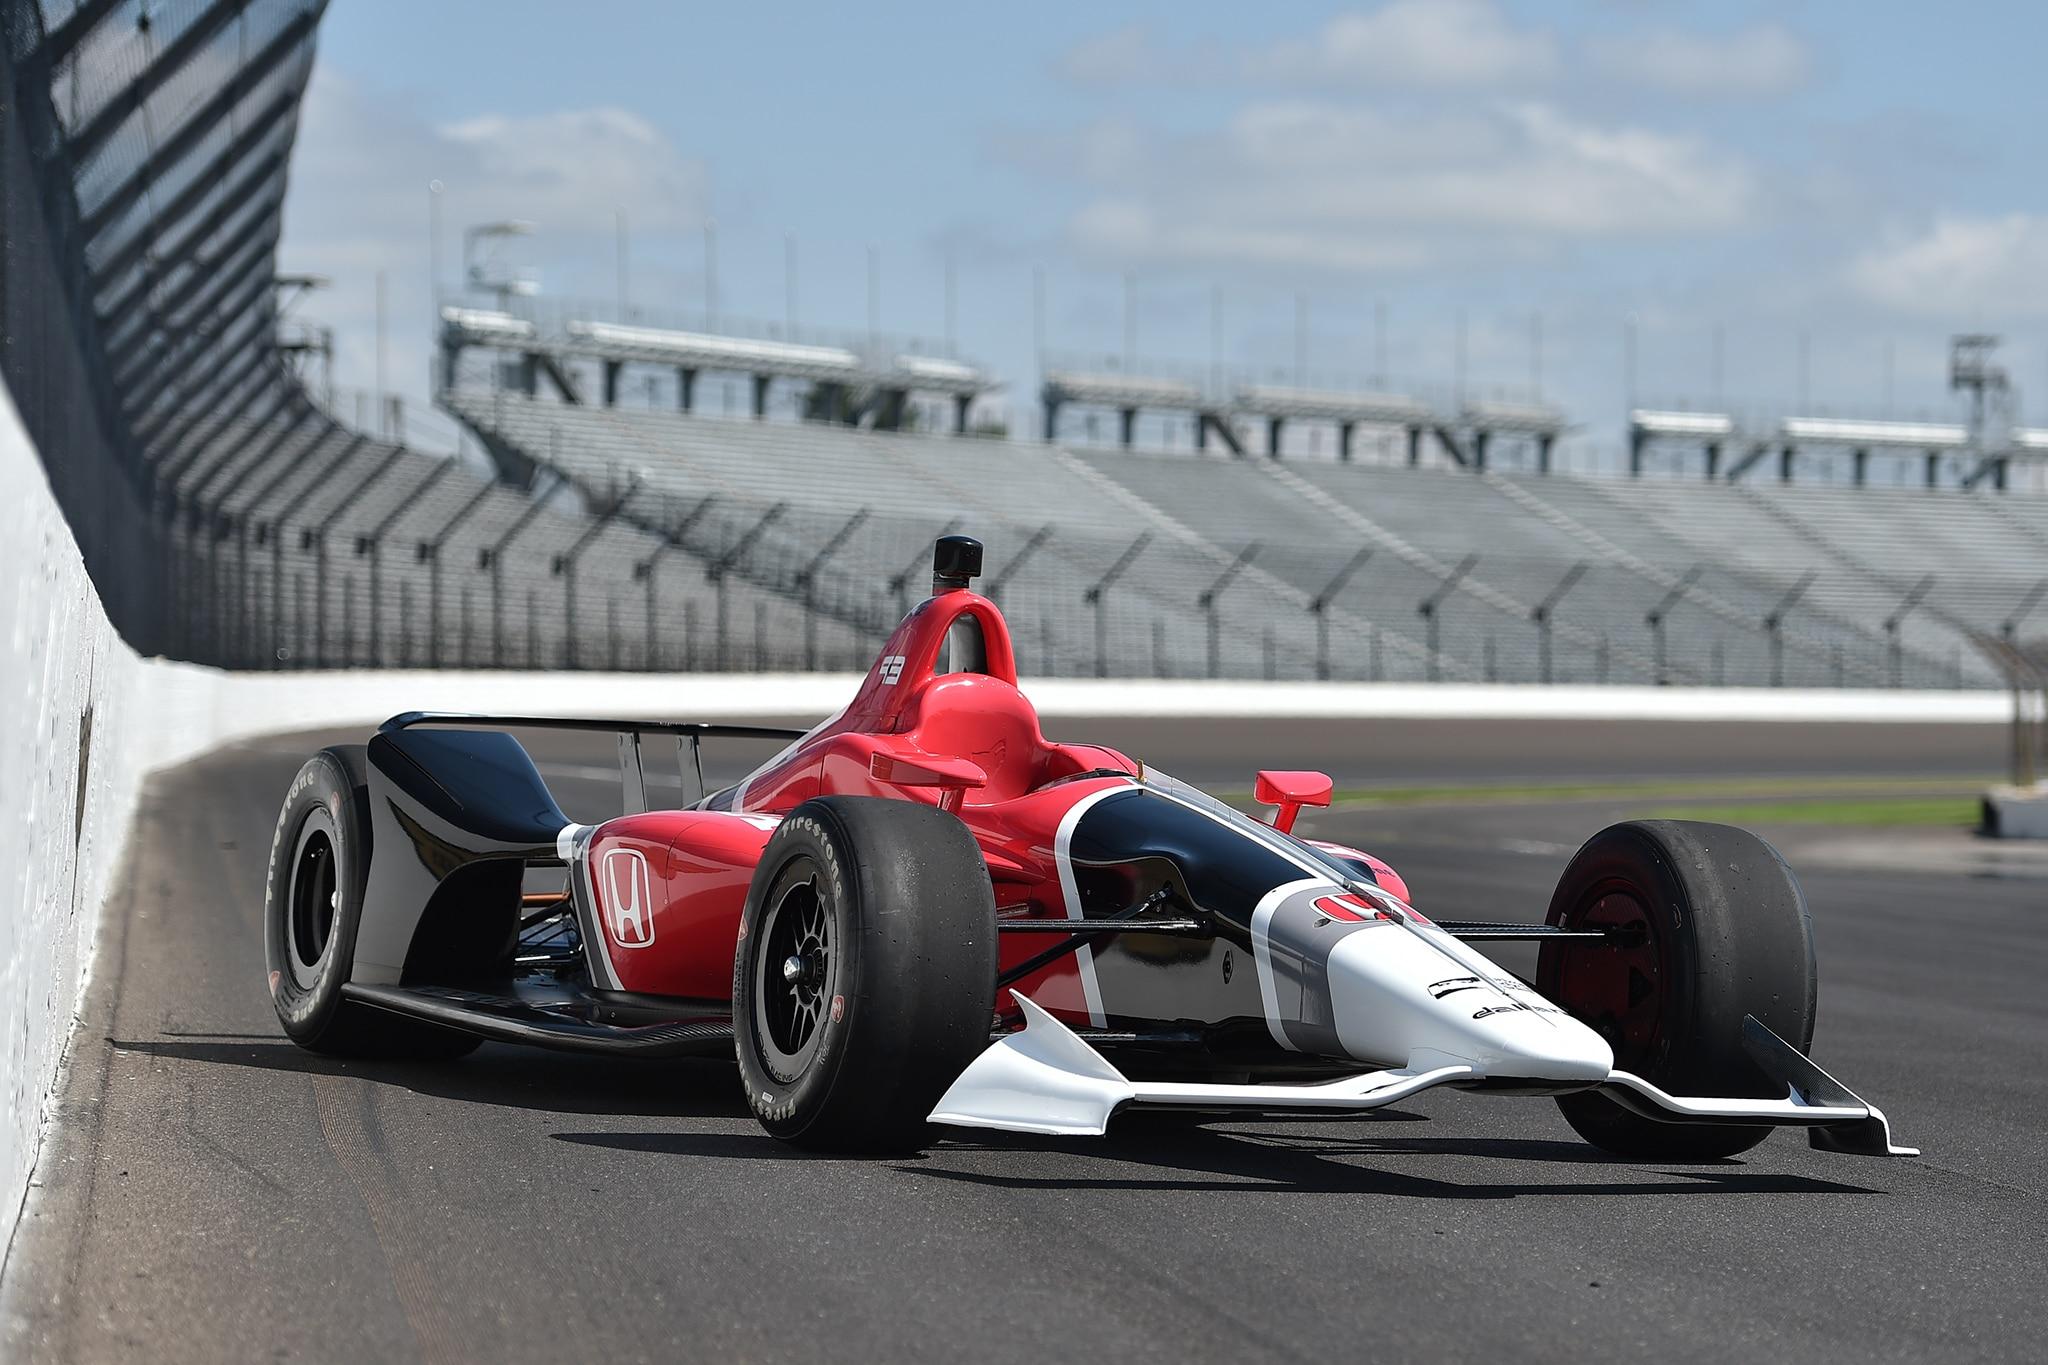 IndyCar 2018 Race Car 24